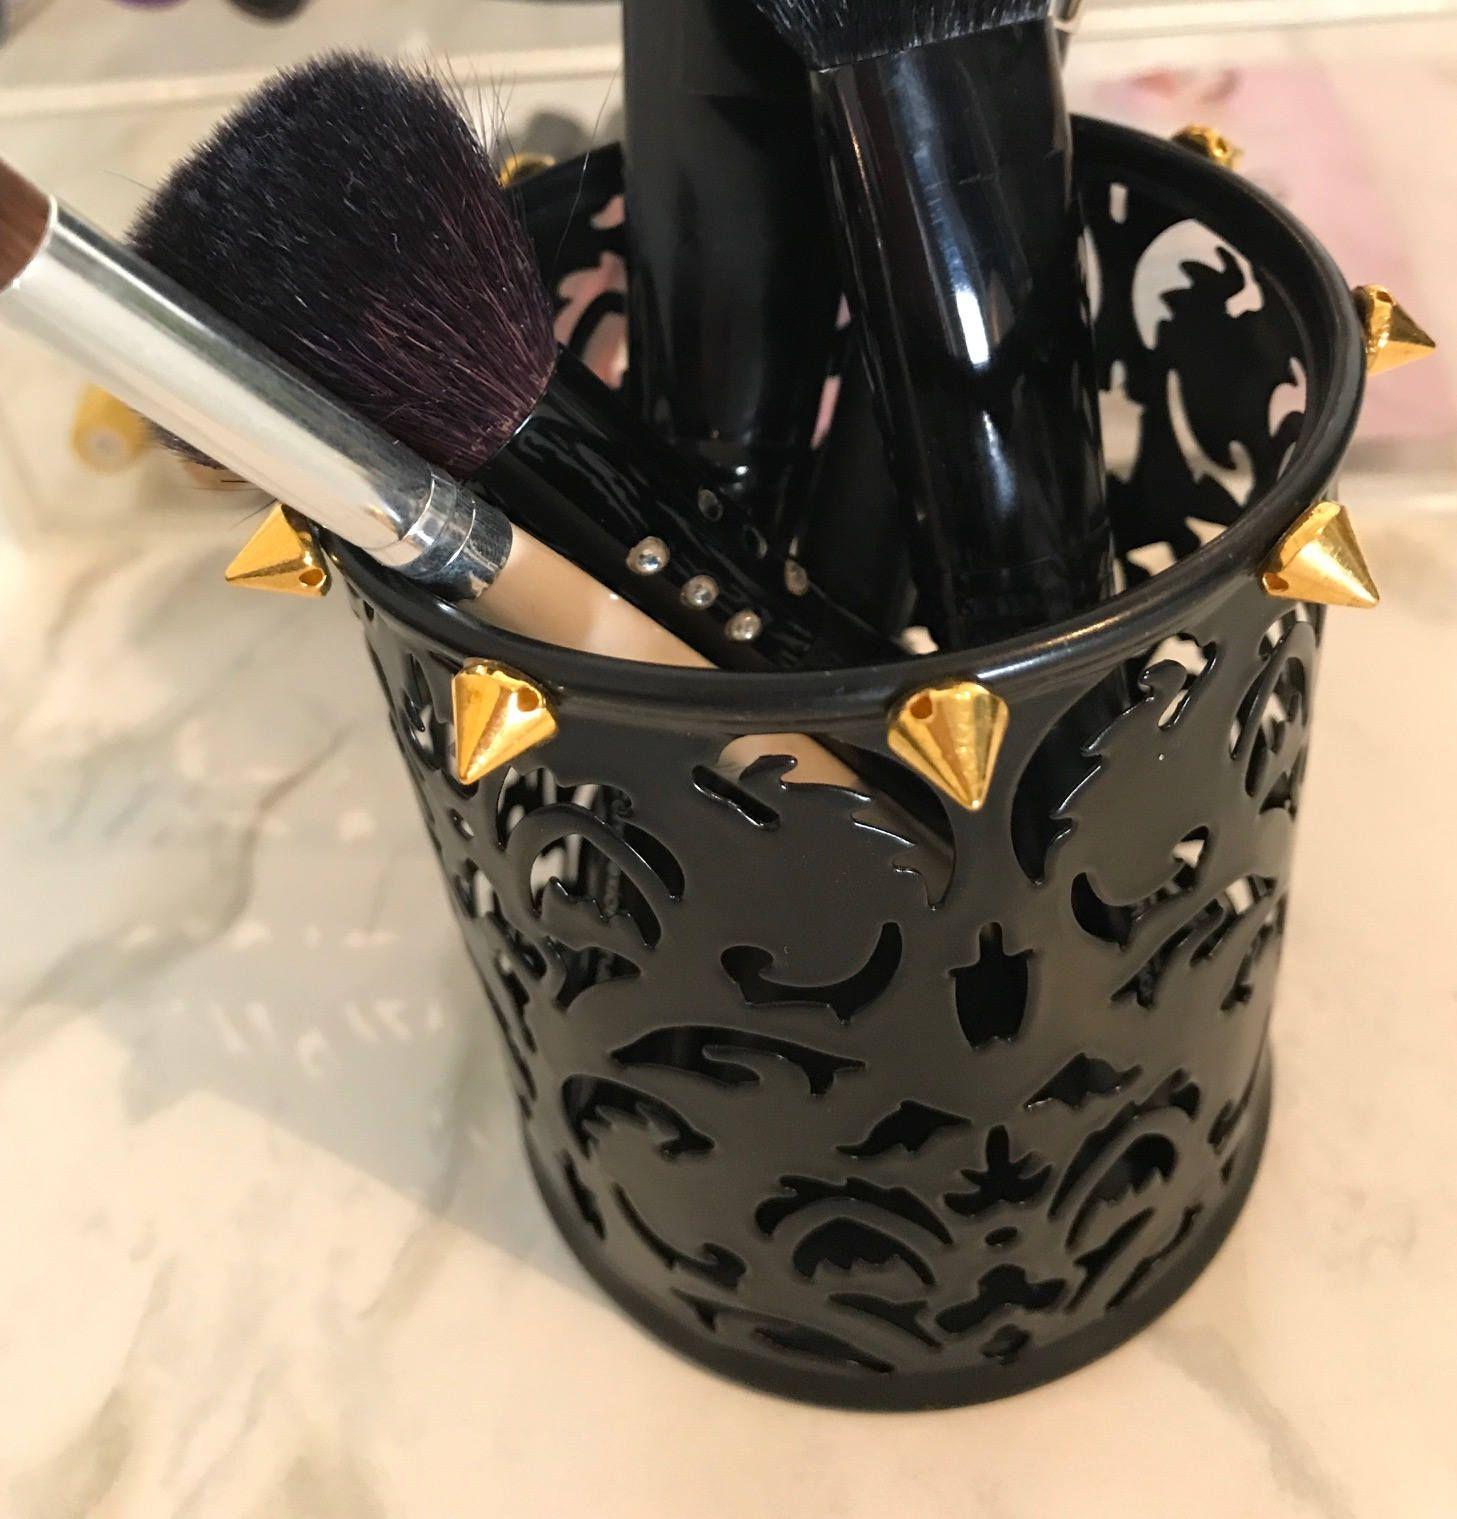 Cute Black Makeup Brush Holder,Makeup Brush Cup, Black and